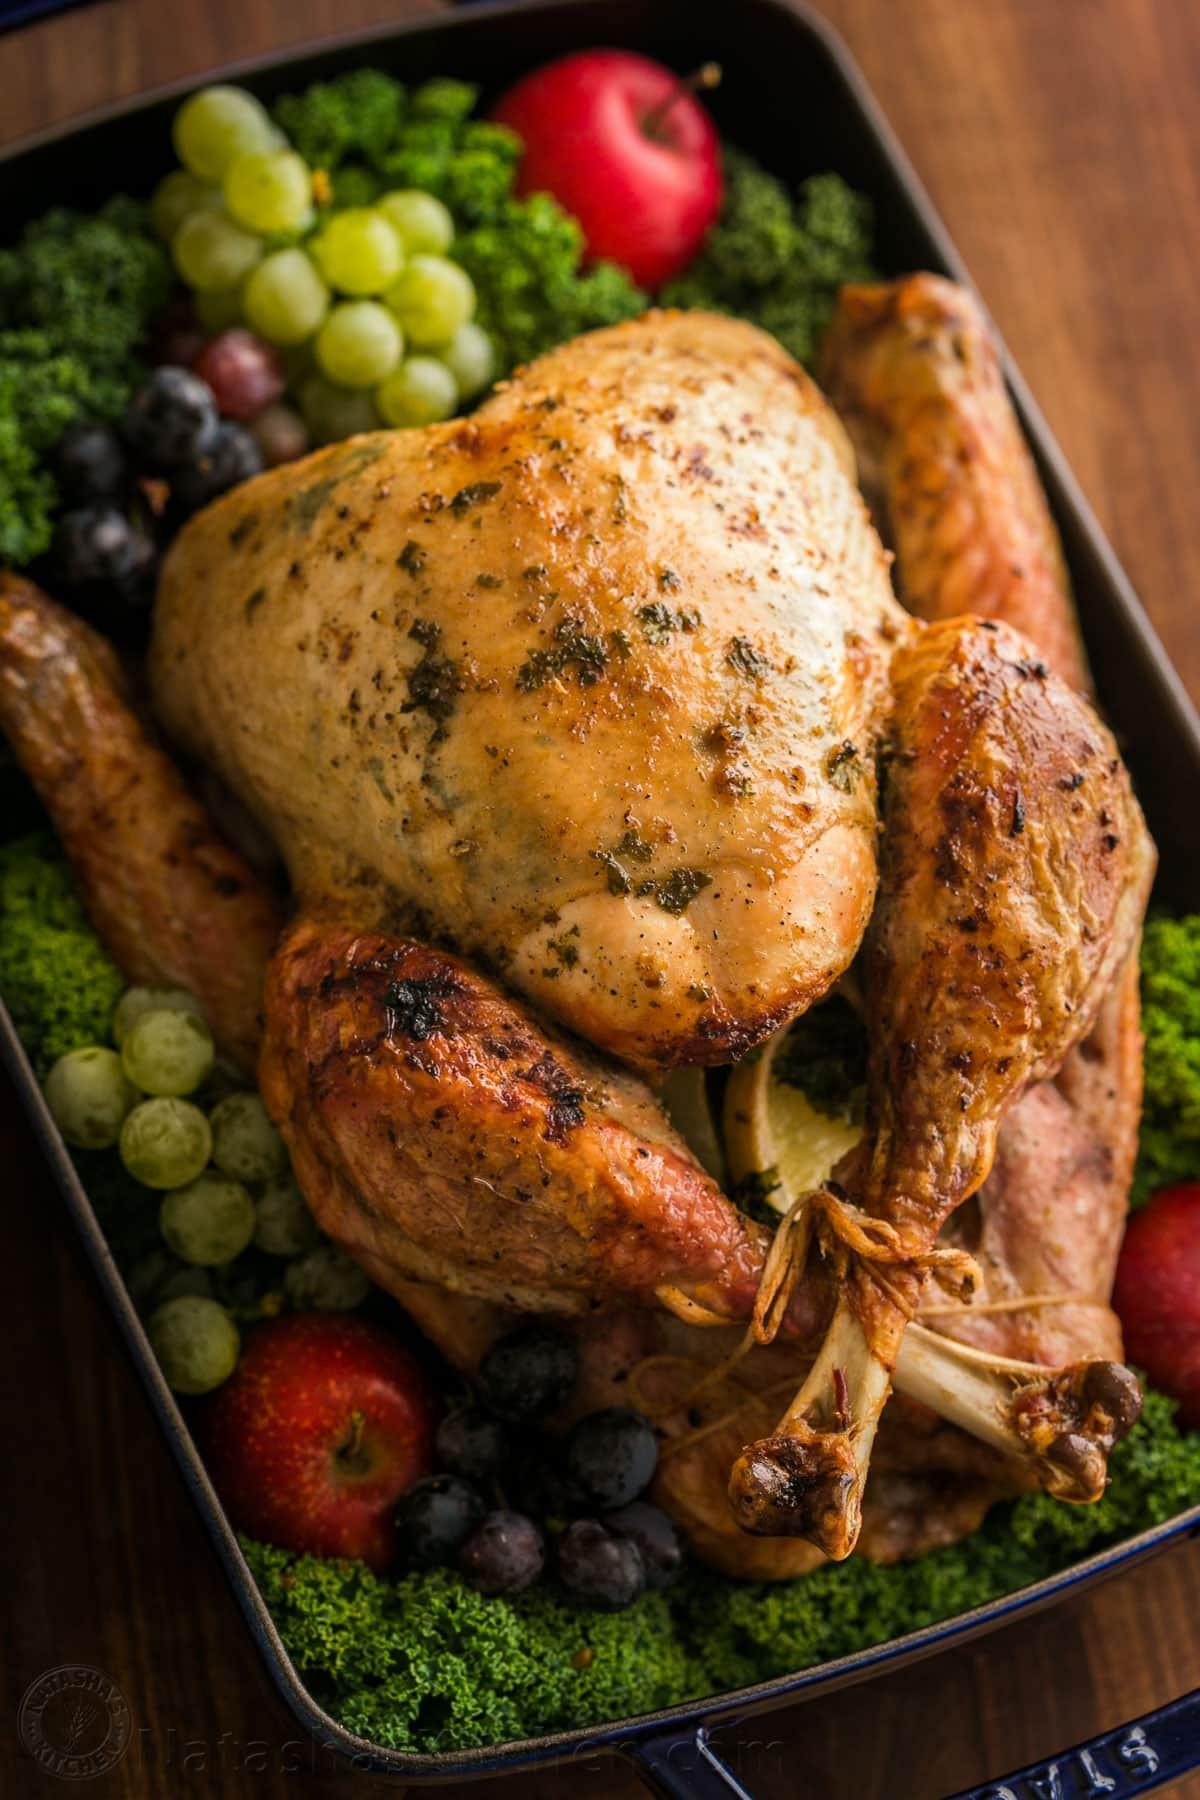 Best Turkey Recipes For Thanksgiving  Thanksgiving Turkey Recipe VIDEO NatashasKitchen